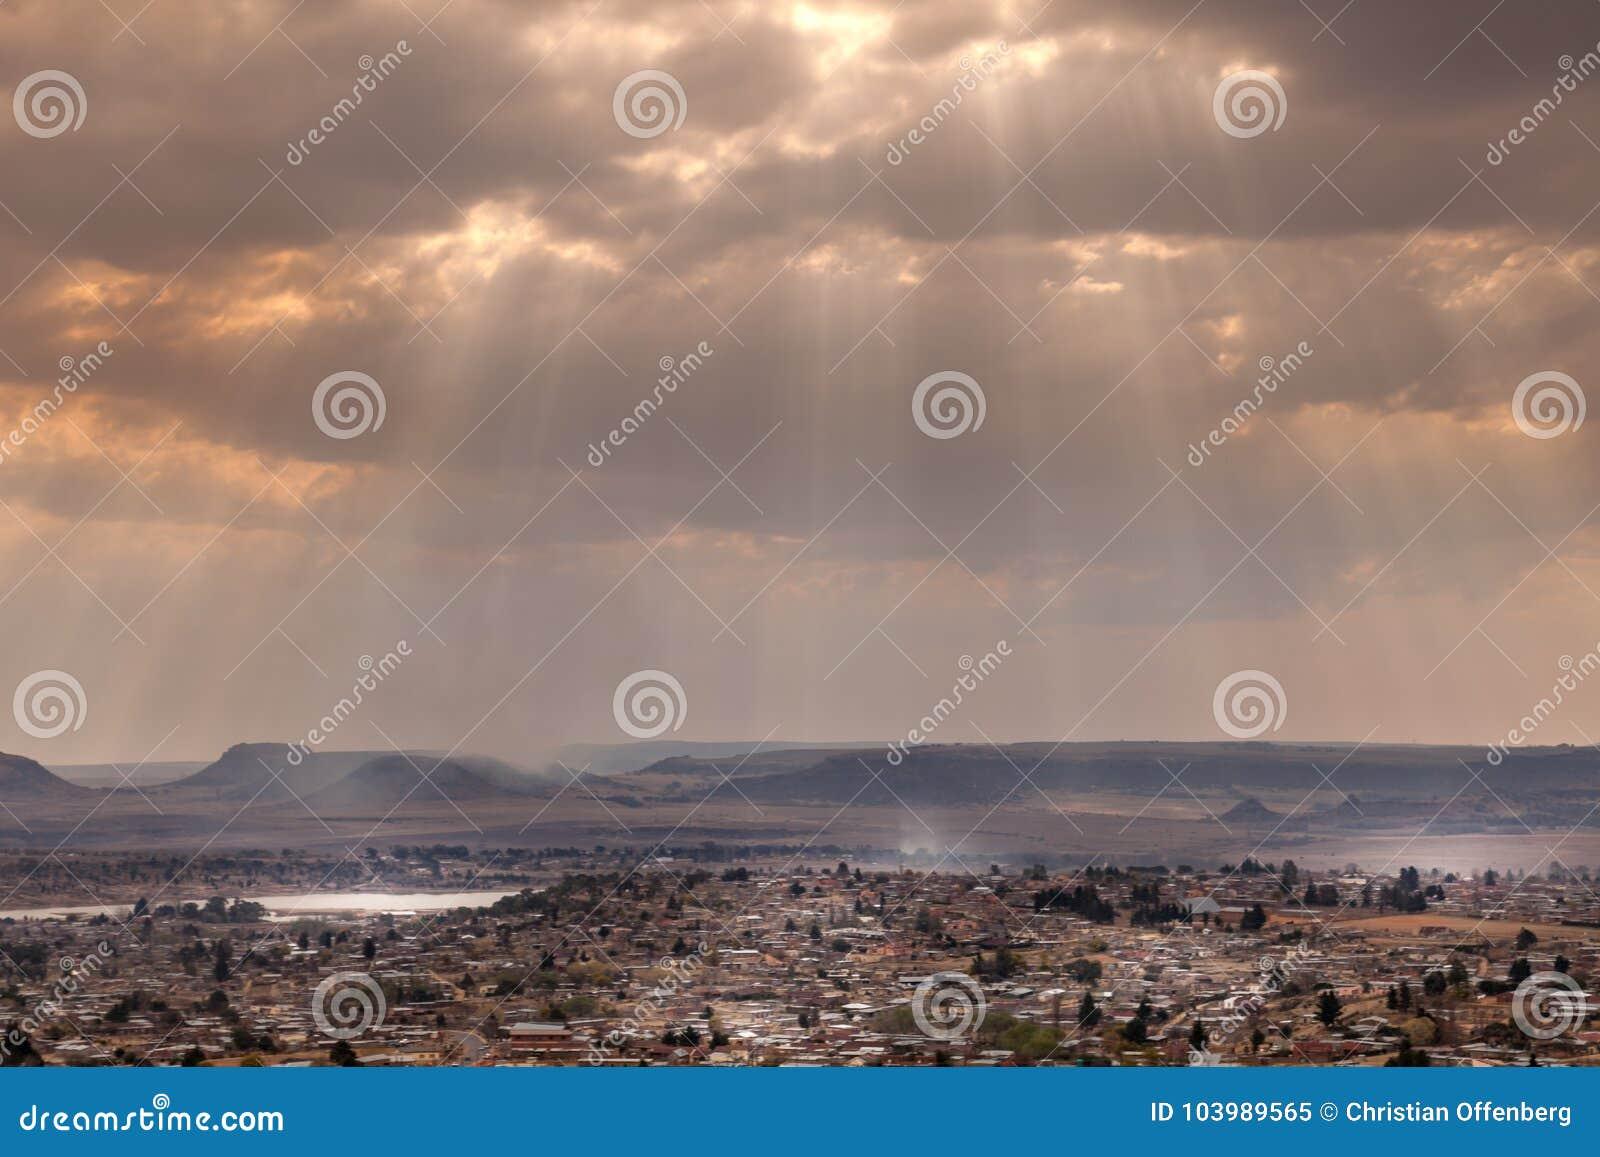 La città di Maseru, Lesotho